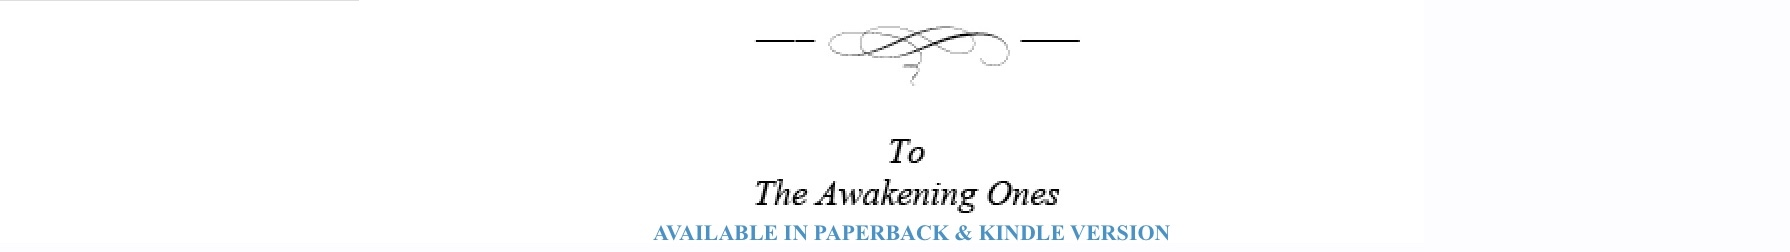 THE AWAKENING ONES DEDICATION WEB.jpeg